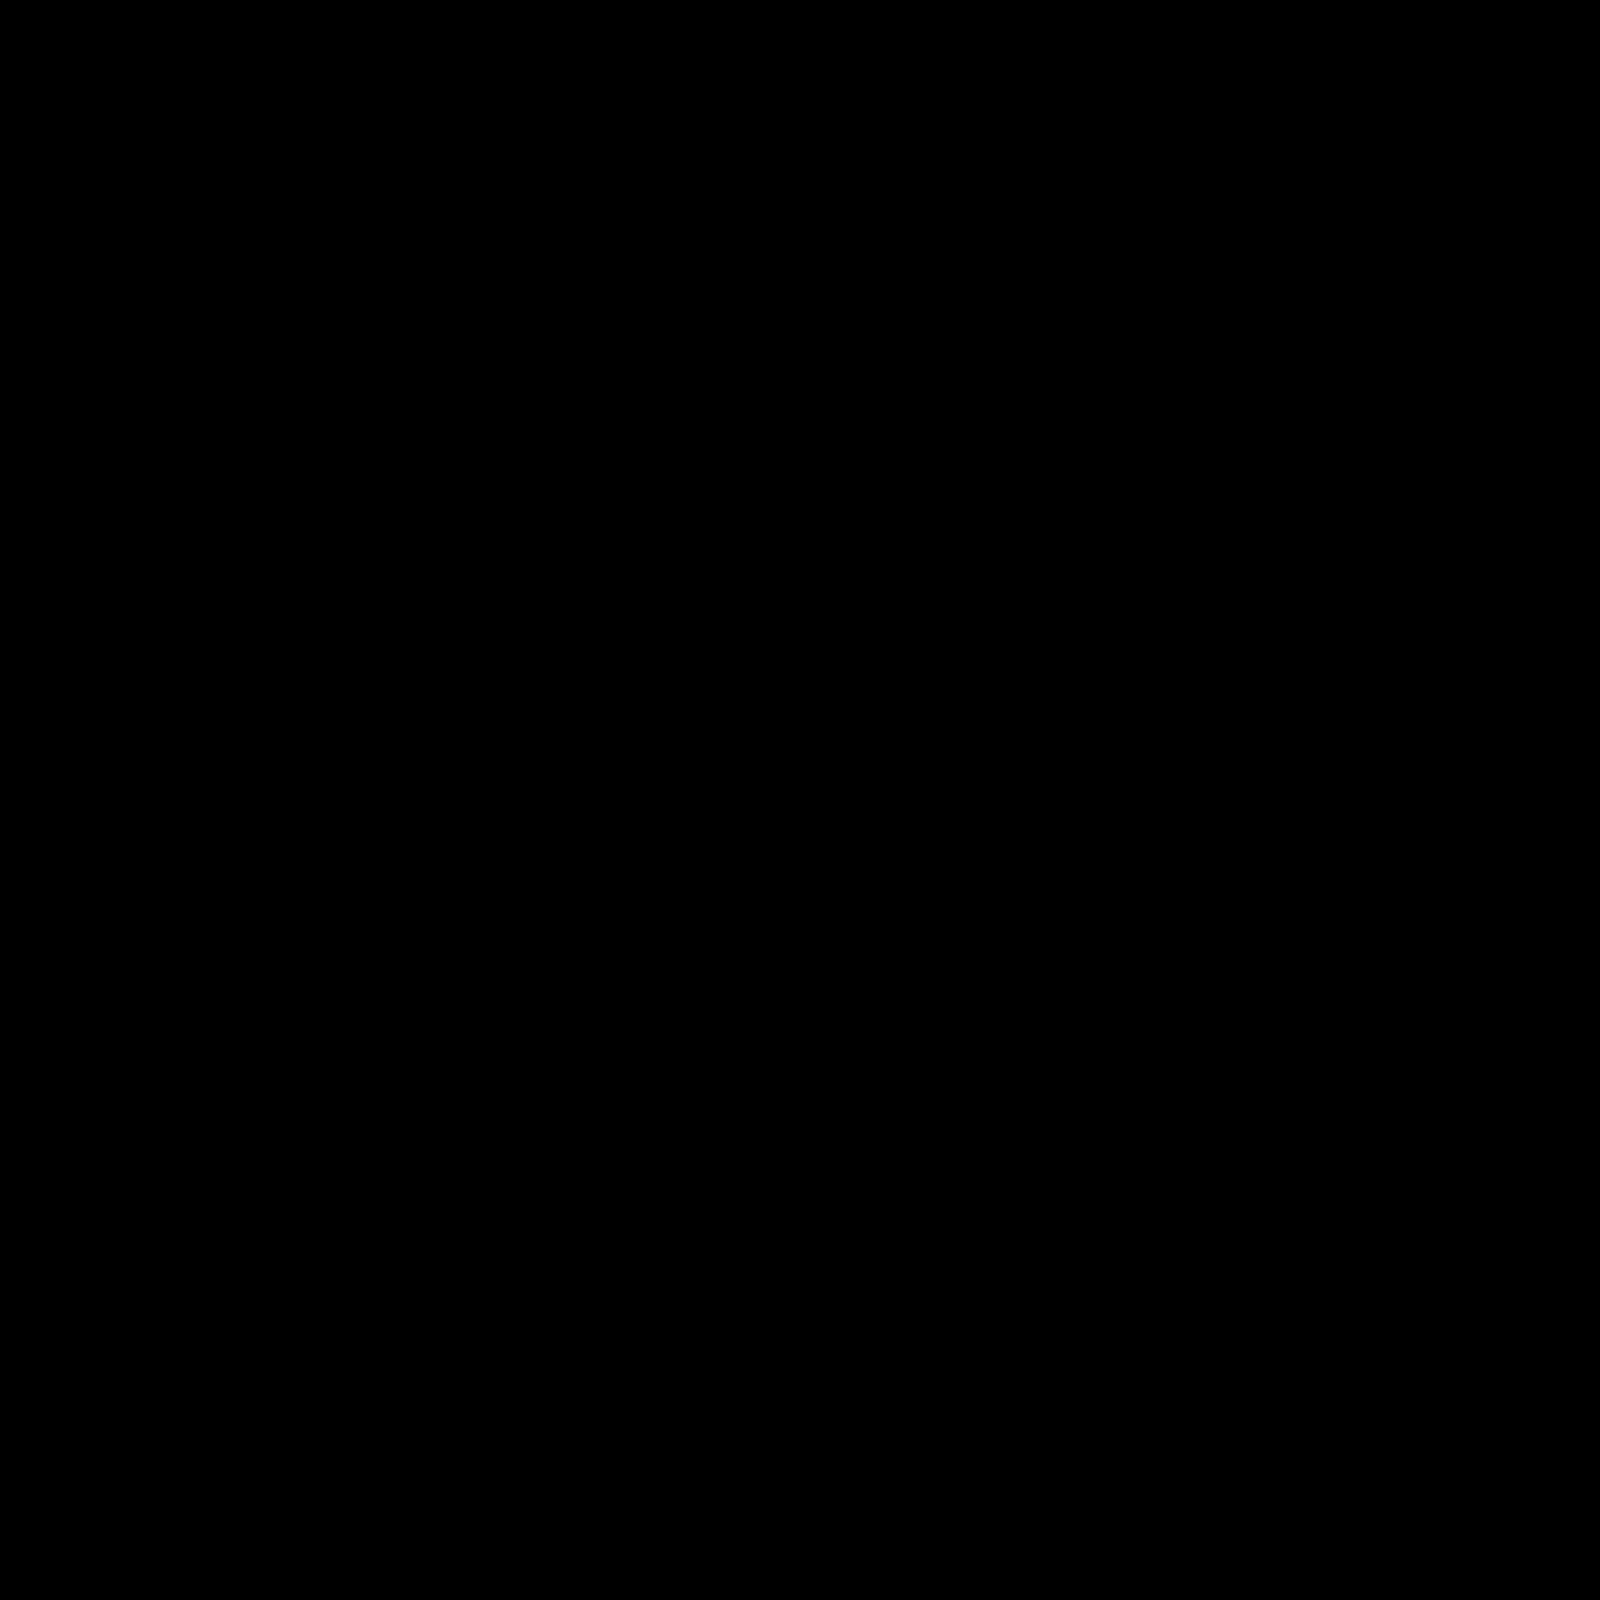 Tick Box PNG - 162941